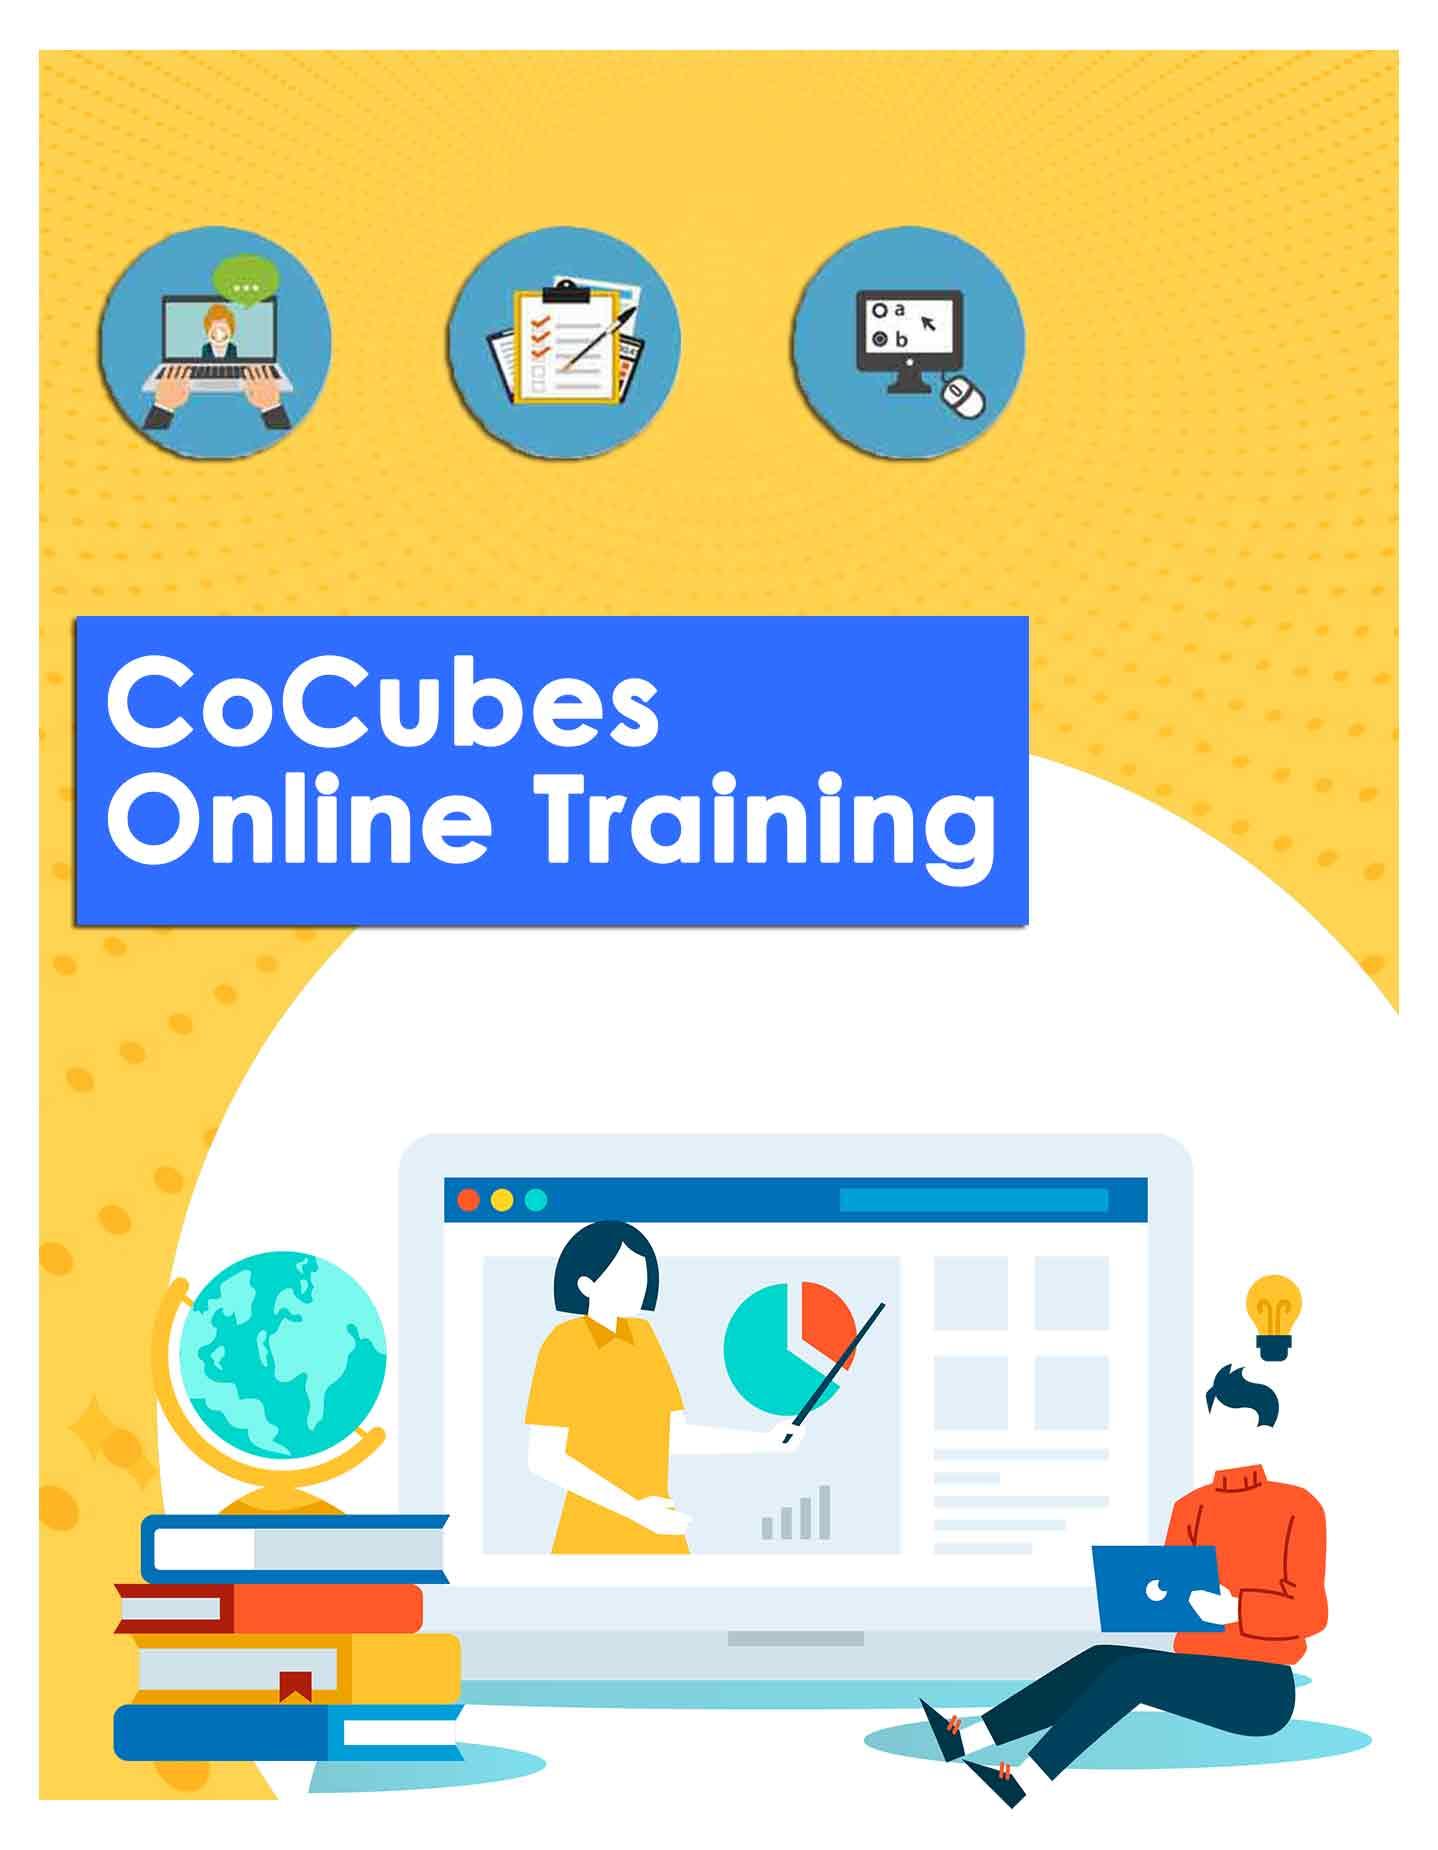 CoCubes Online Training